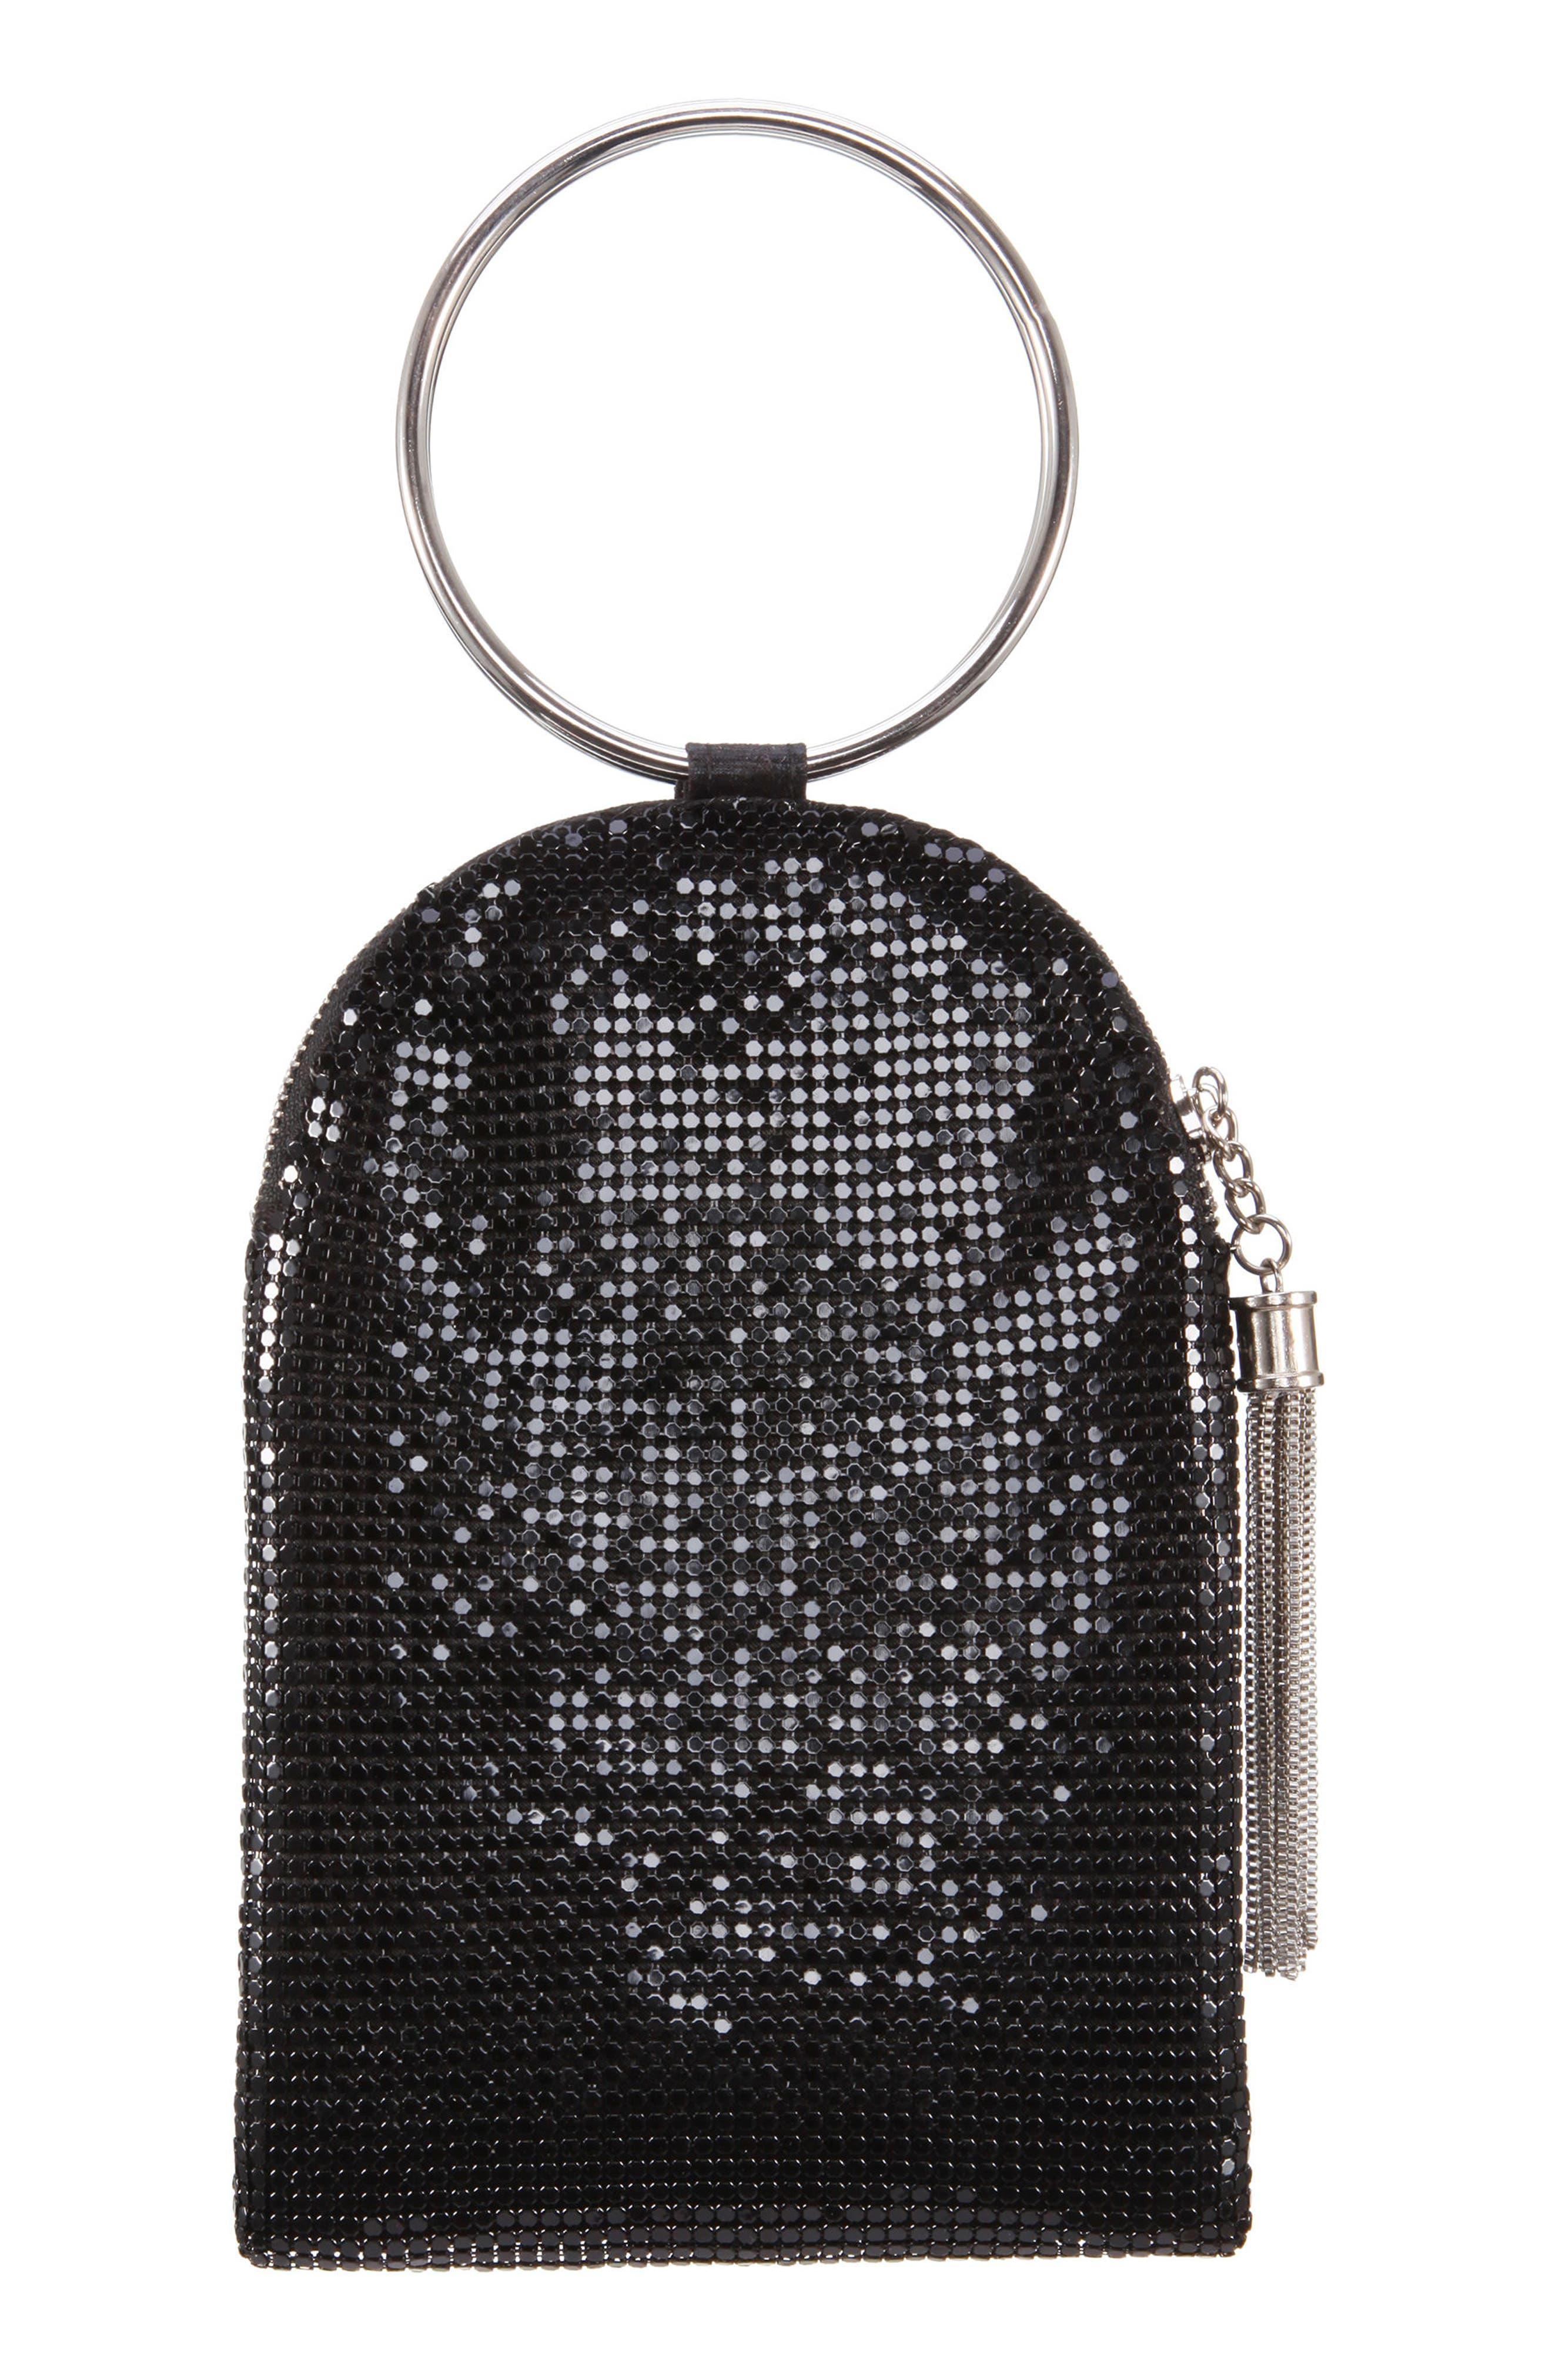 Vintage Handbags, Purses, Bags *New* Nina Metallic Mesh Handbag - $58.00 AT vintagedancer.com